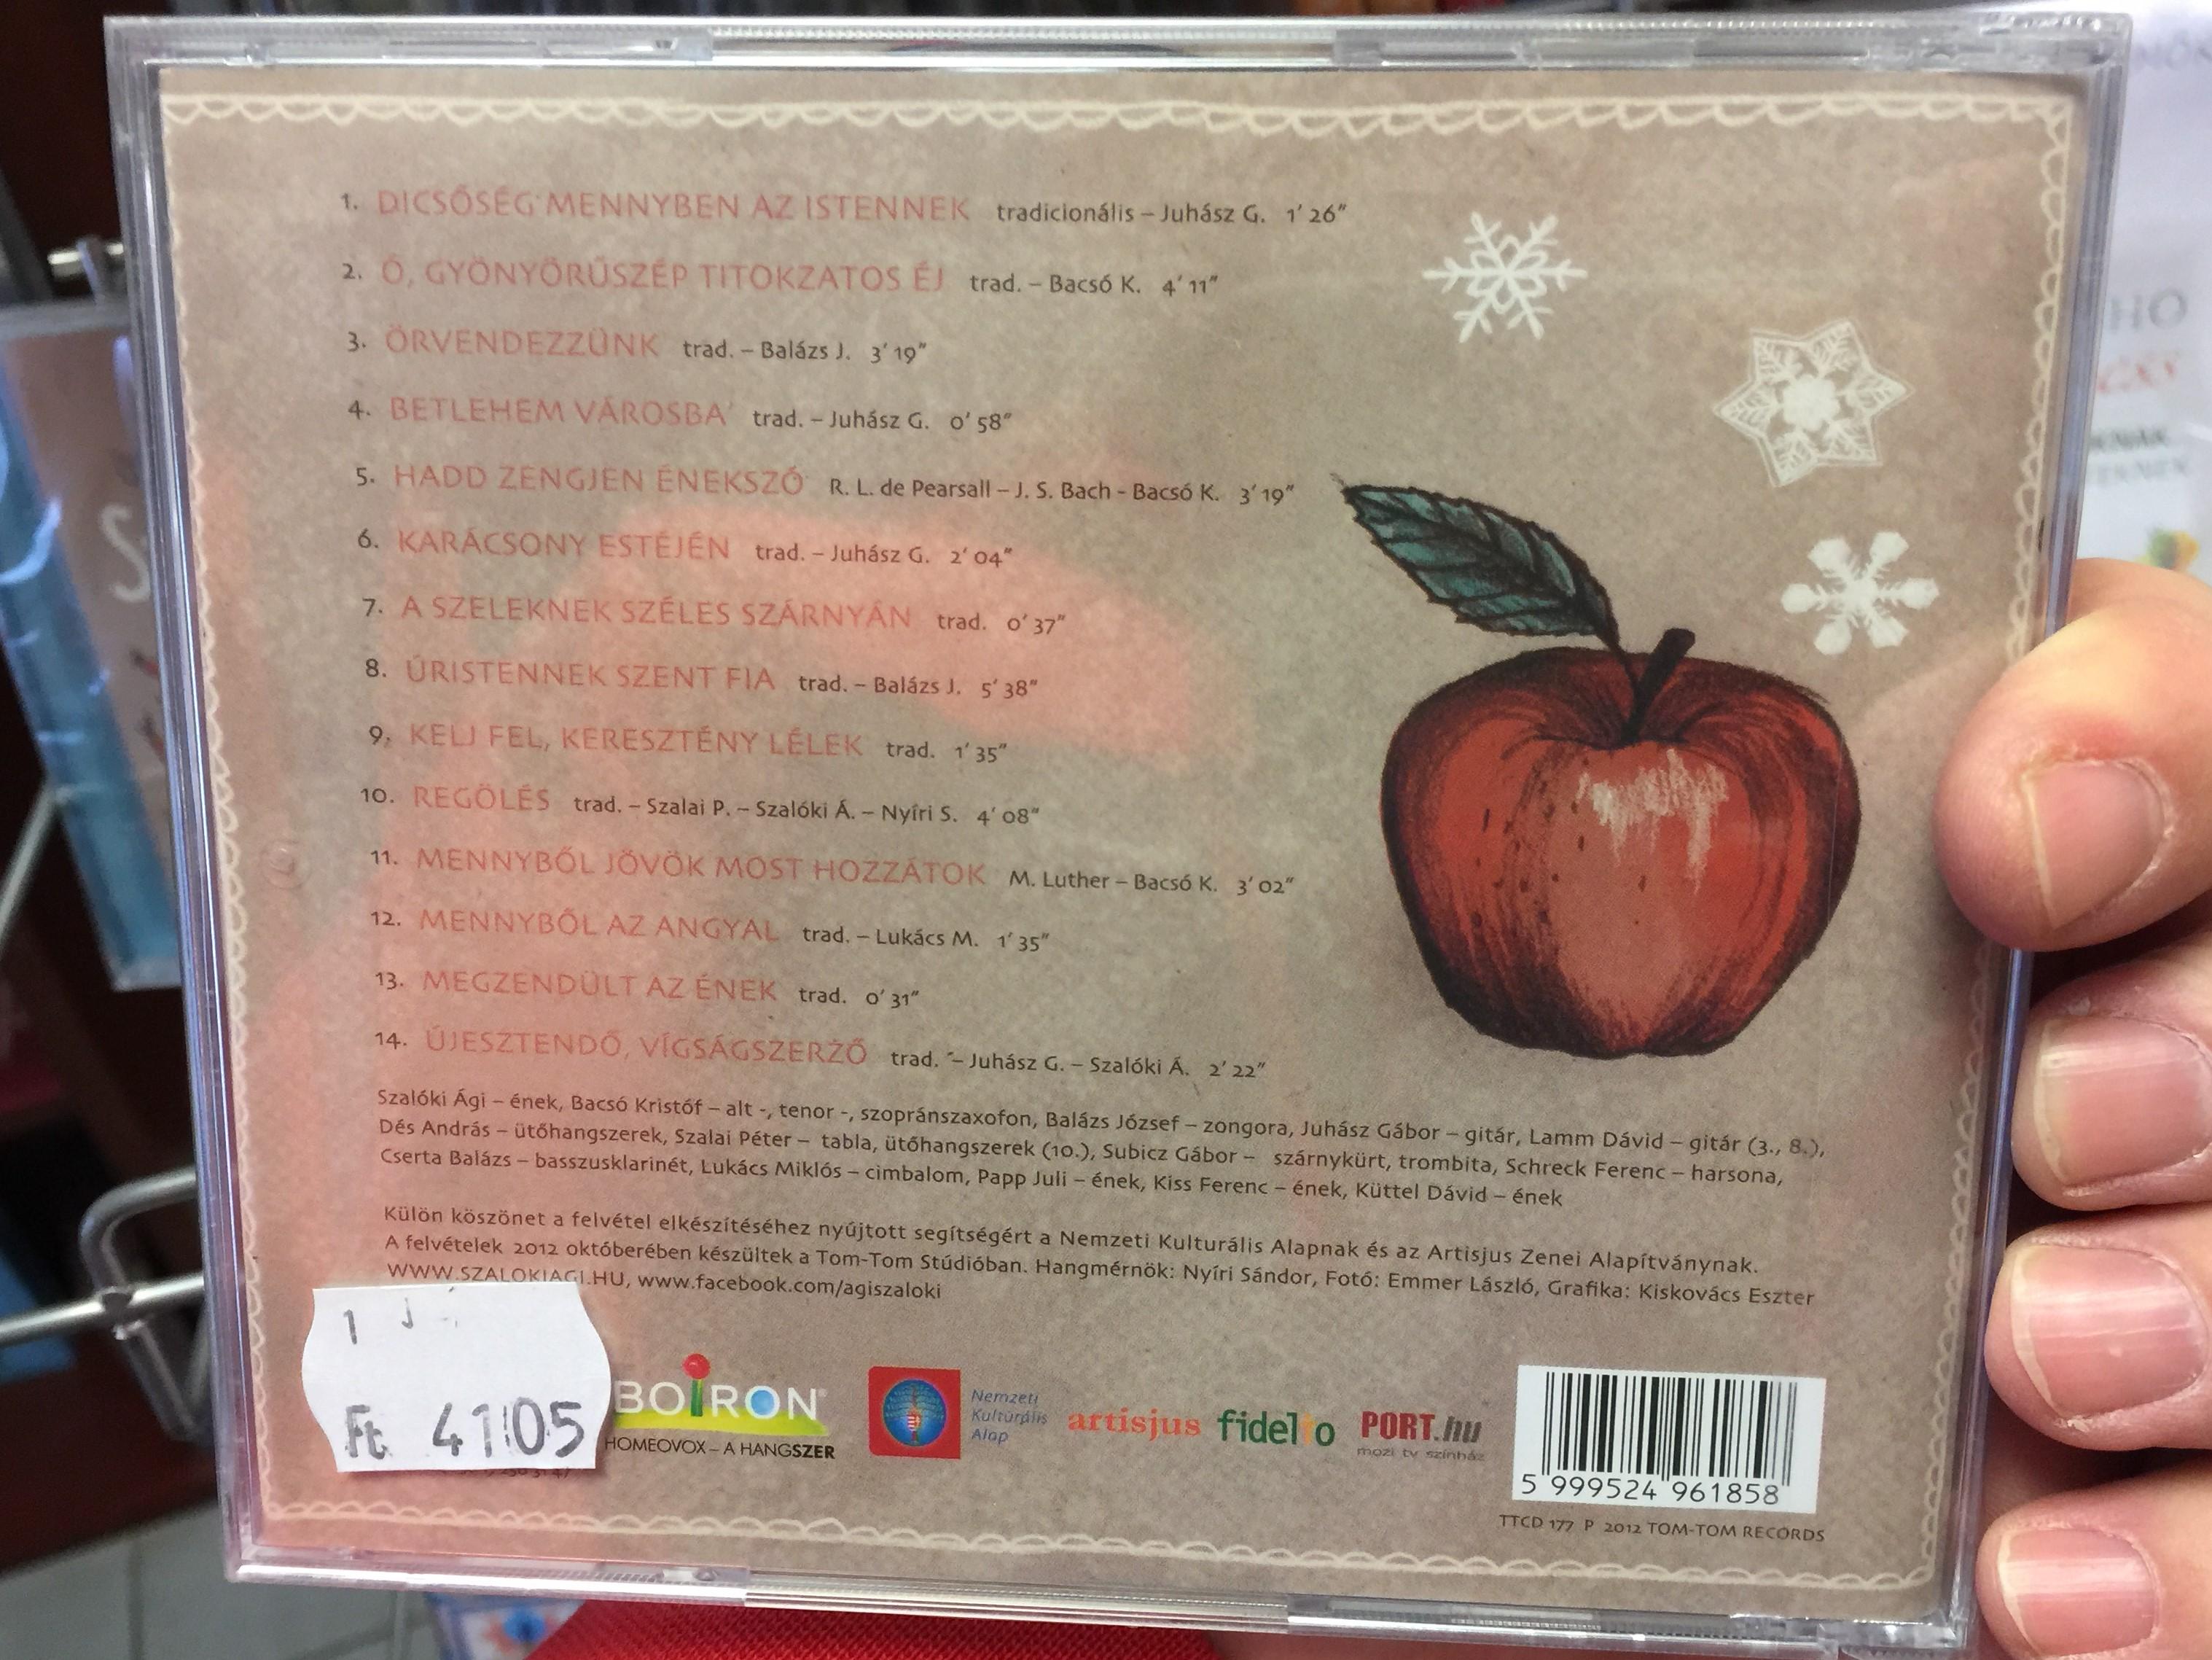 szal-ki-gi-r-me-az-gnek-nnepe-a-f-ldnek-audio-cd-2012-tom-tom-records-2.jpg